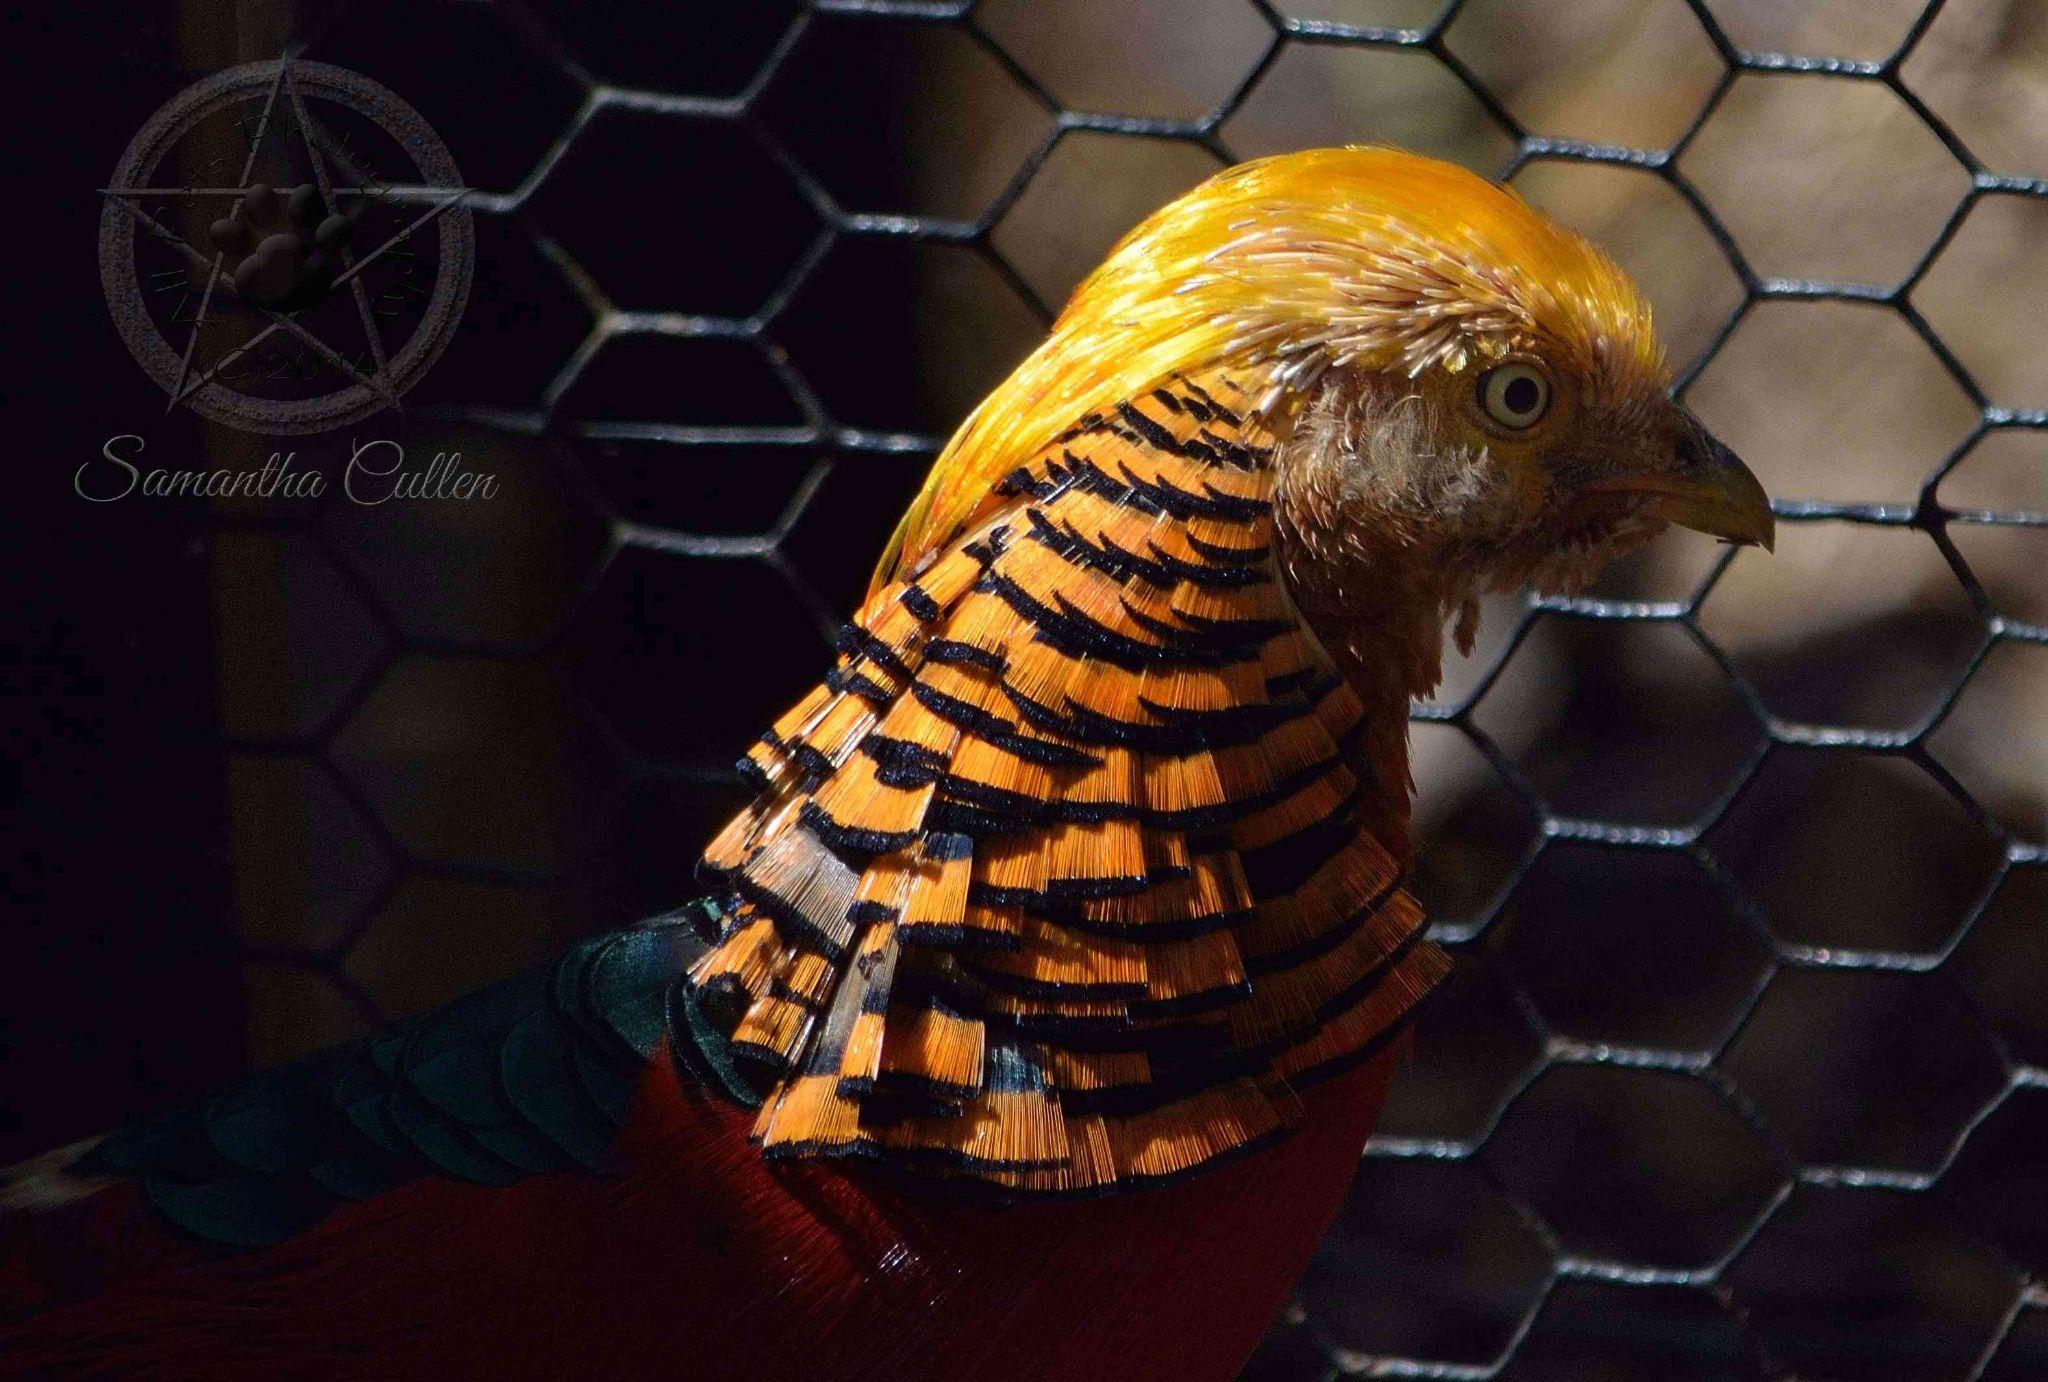 Pheasant by Samantha Cullen